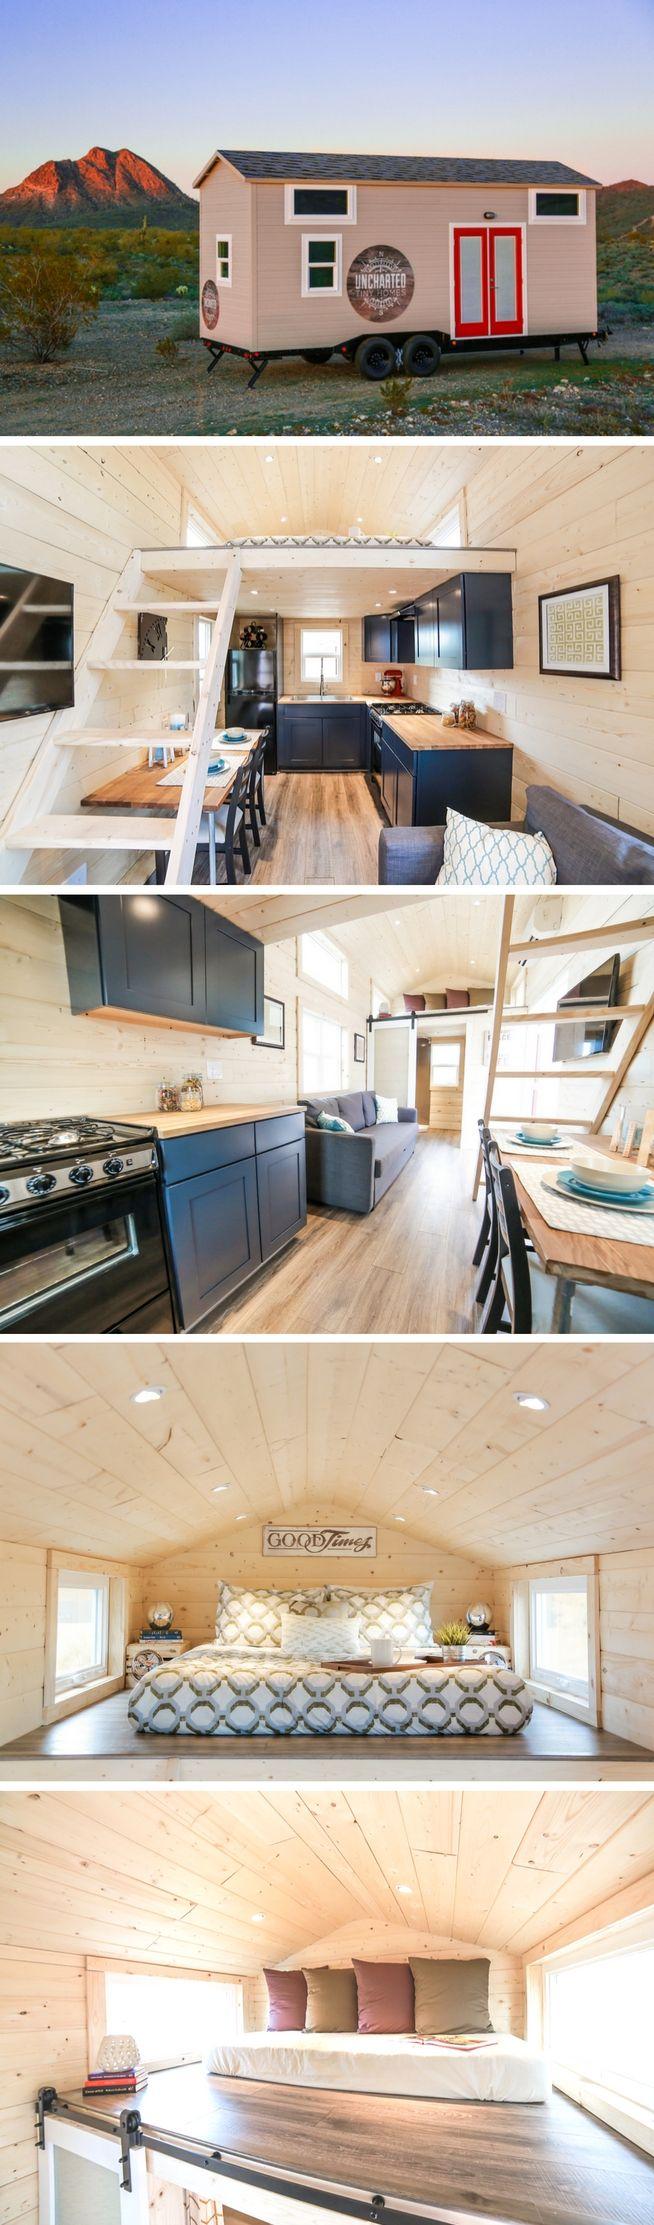 Bauwagen-großes Mini Haus